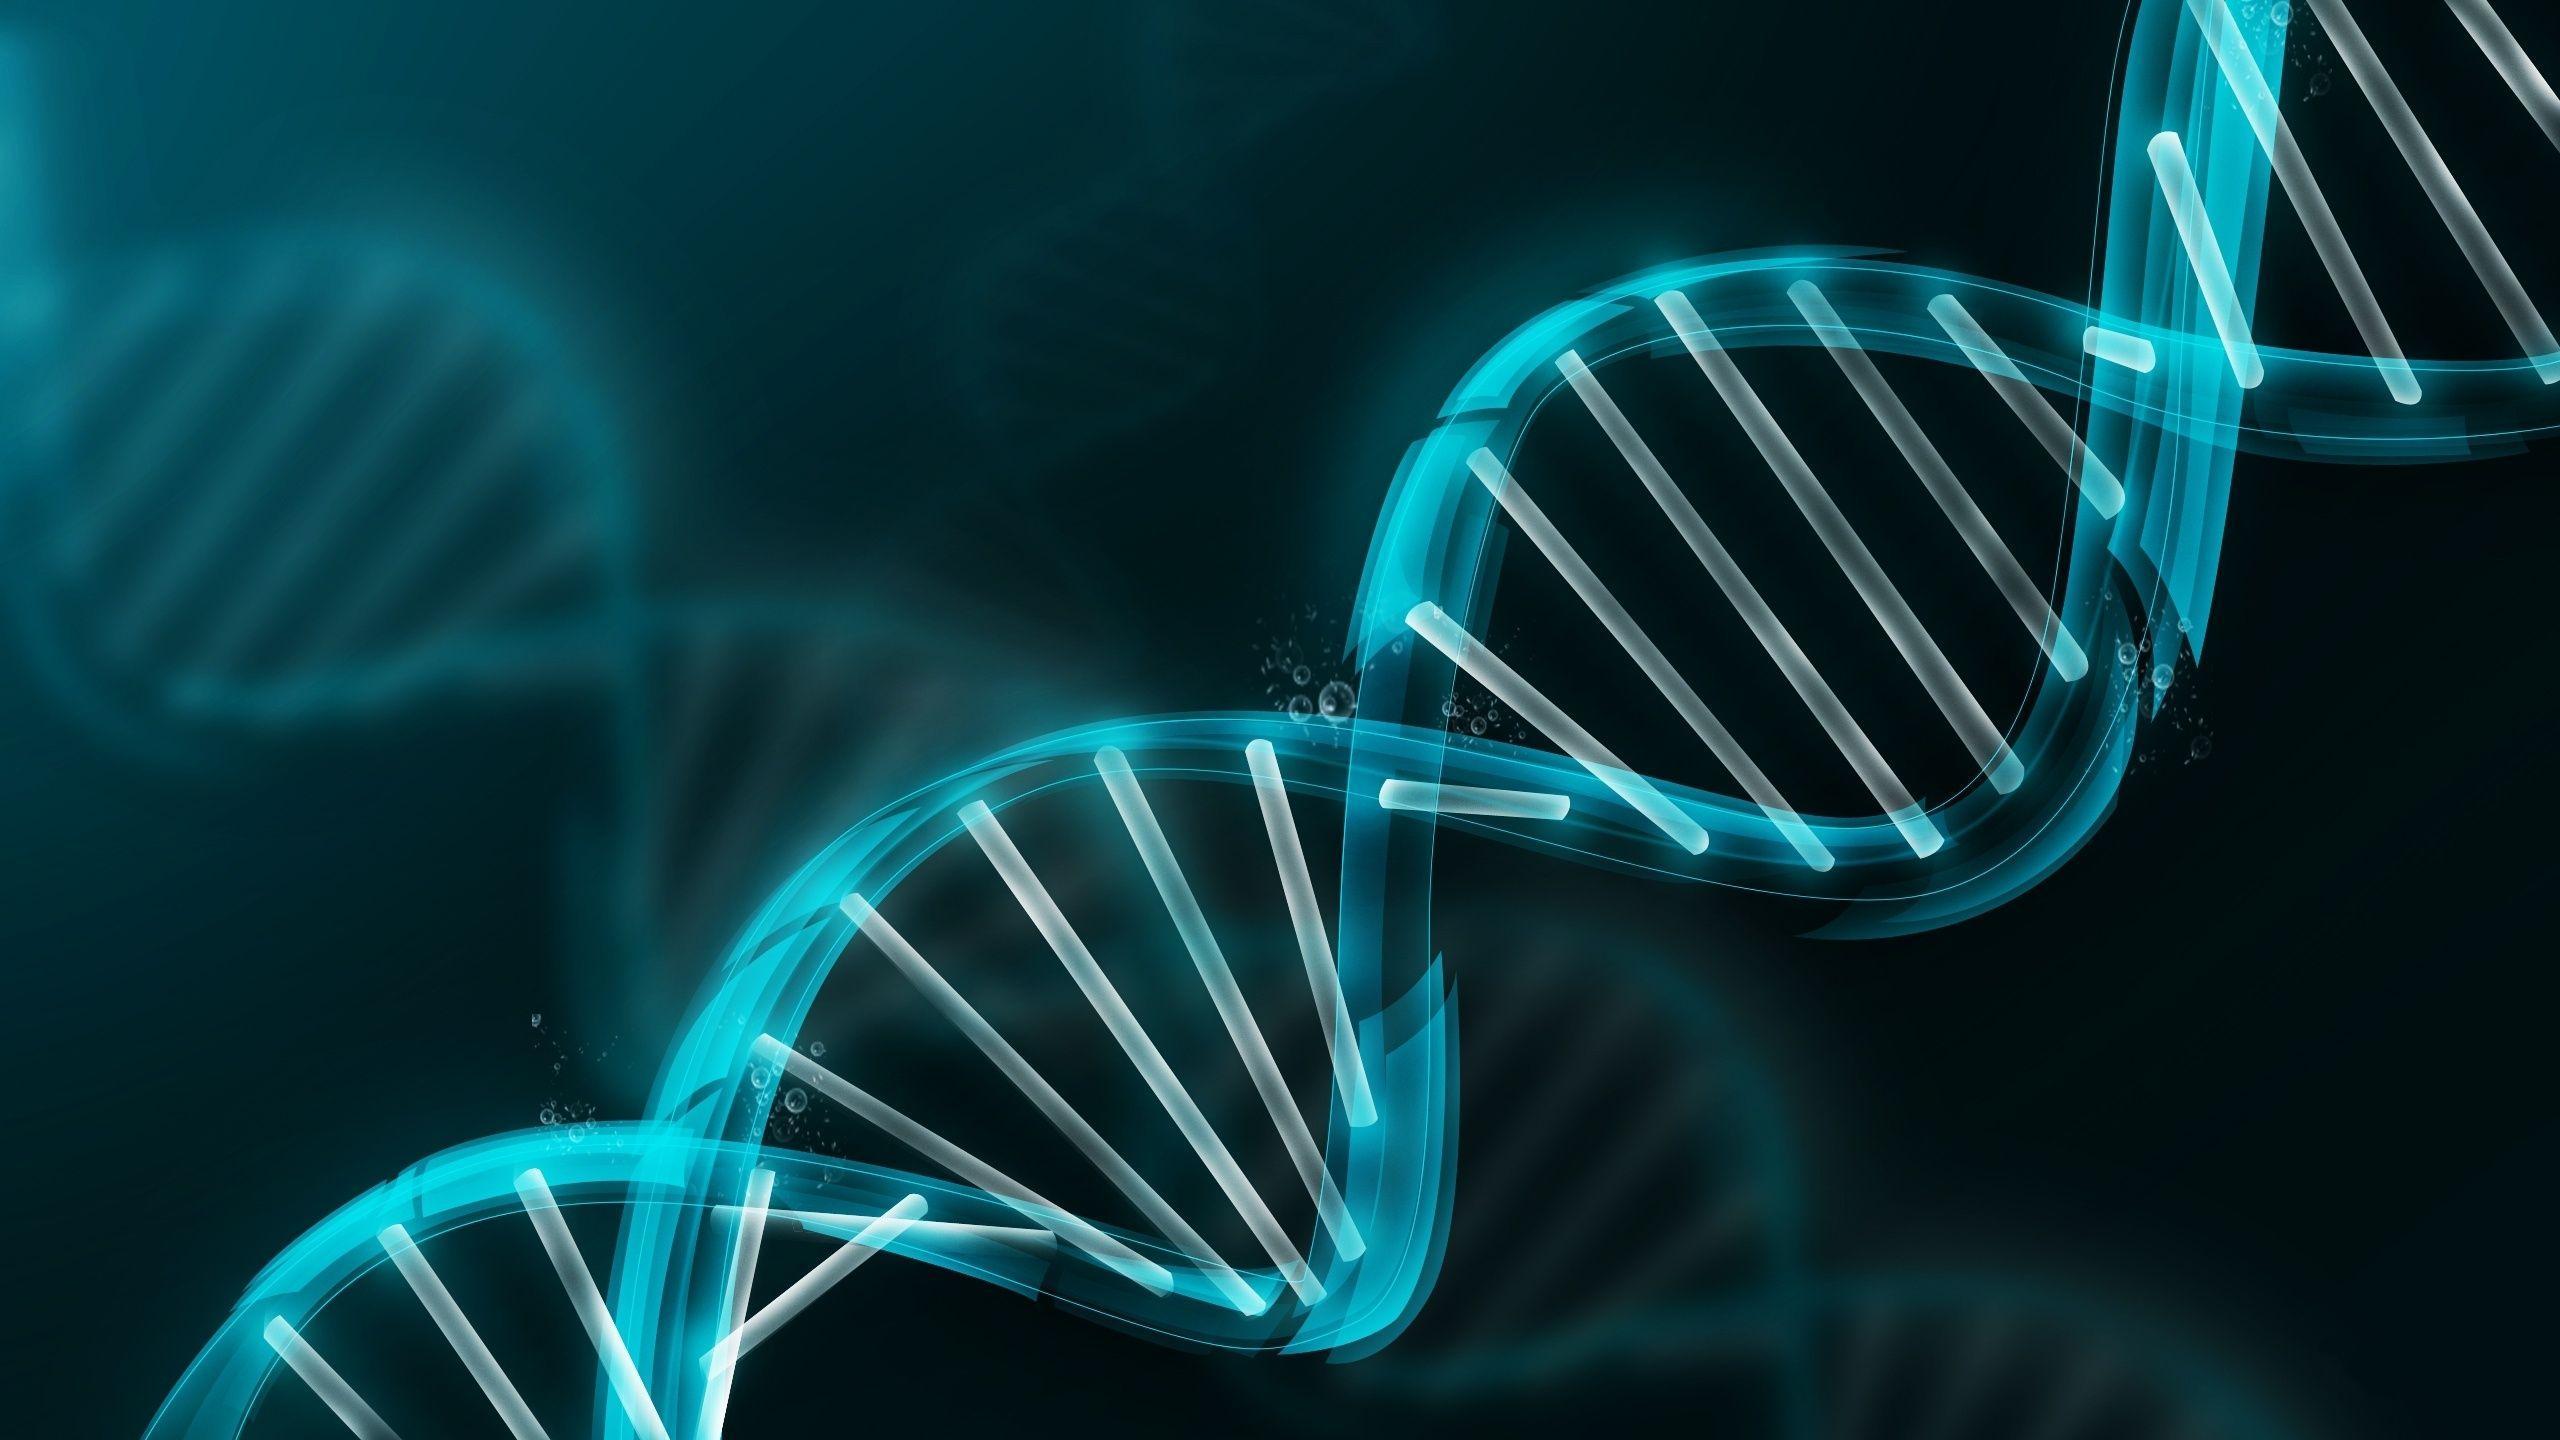 Genetic Wallpapers - Wallpaper Cave